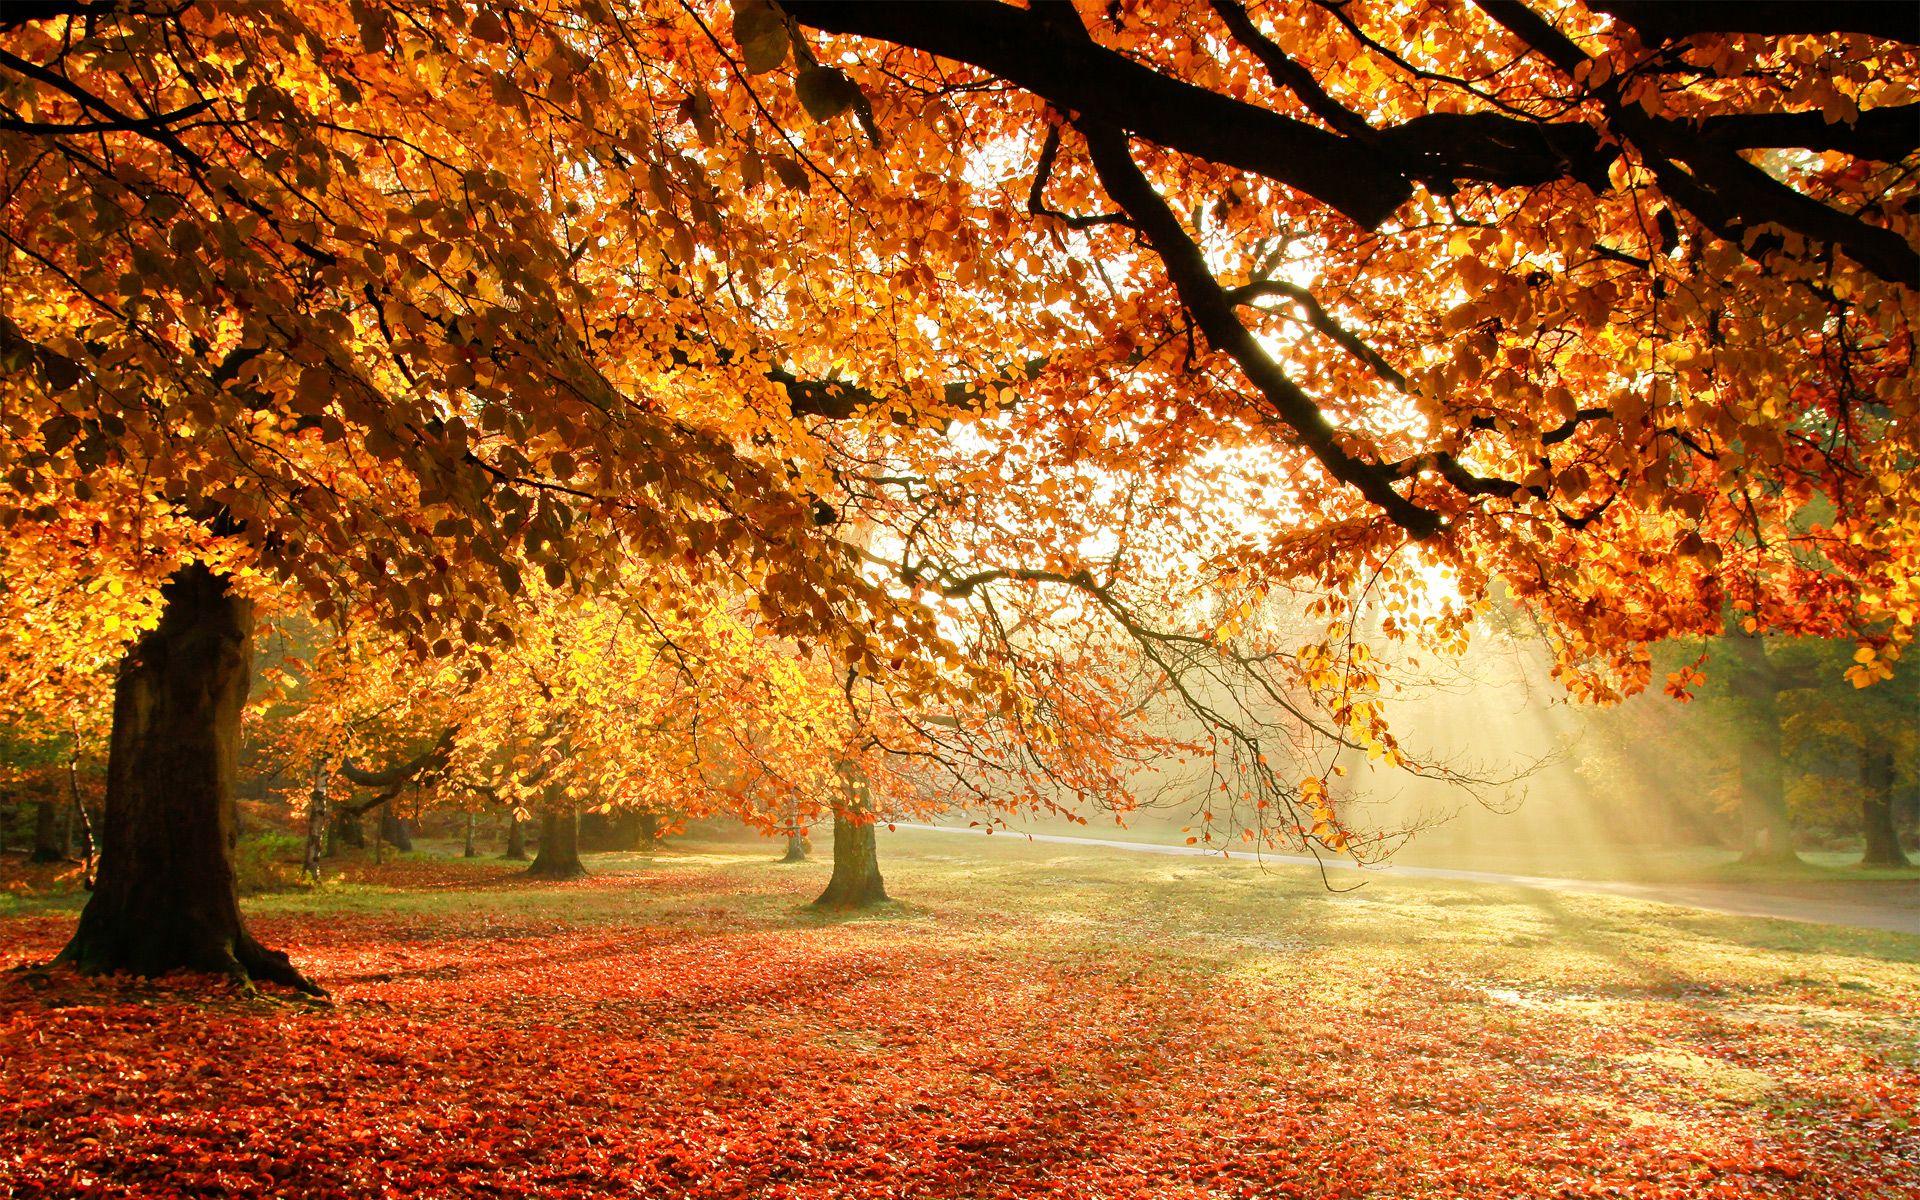 An Unconventional Thanksgiving Autumn Trees Nature Wallpaper Landscape